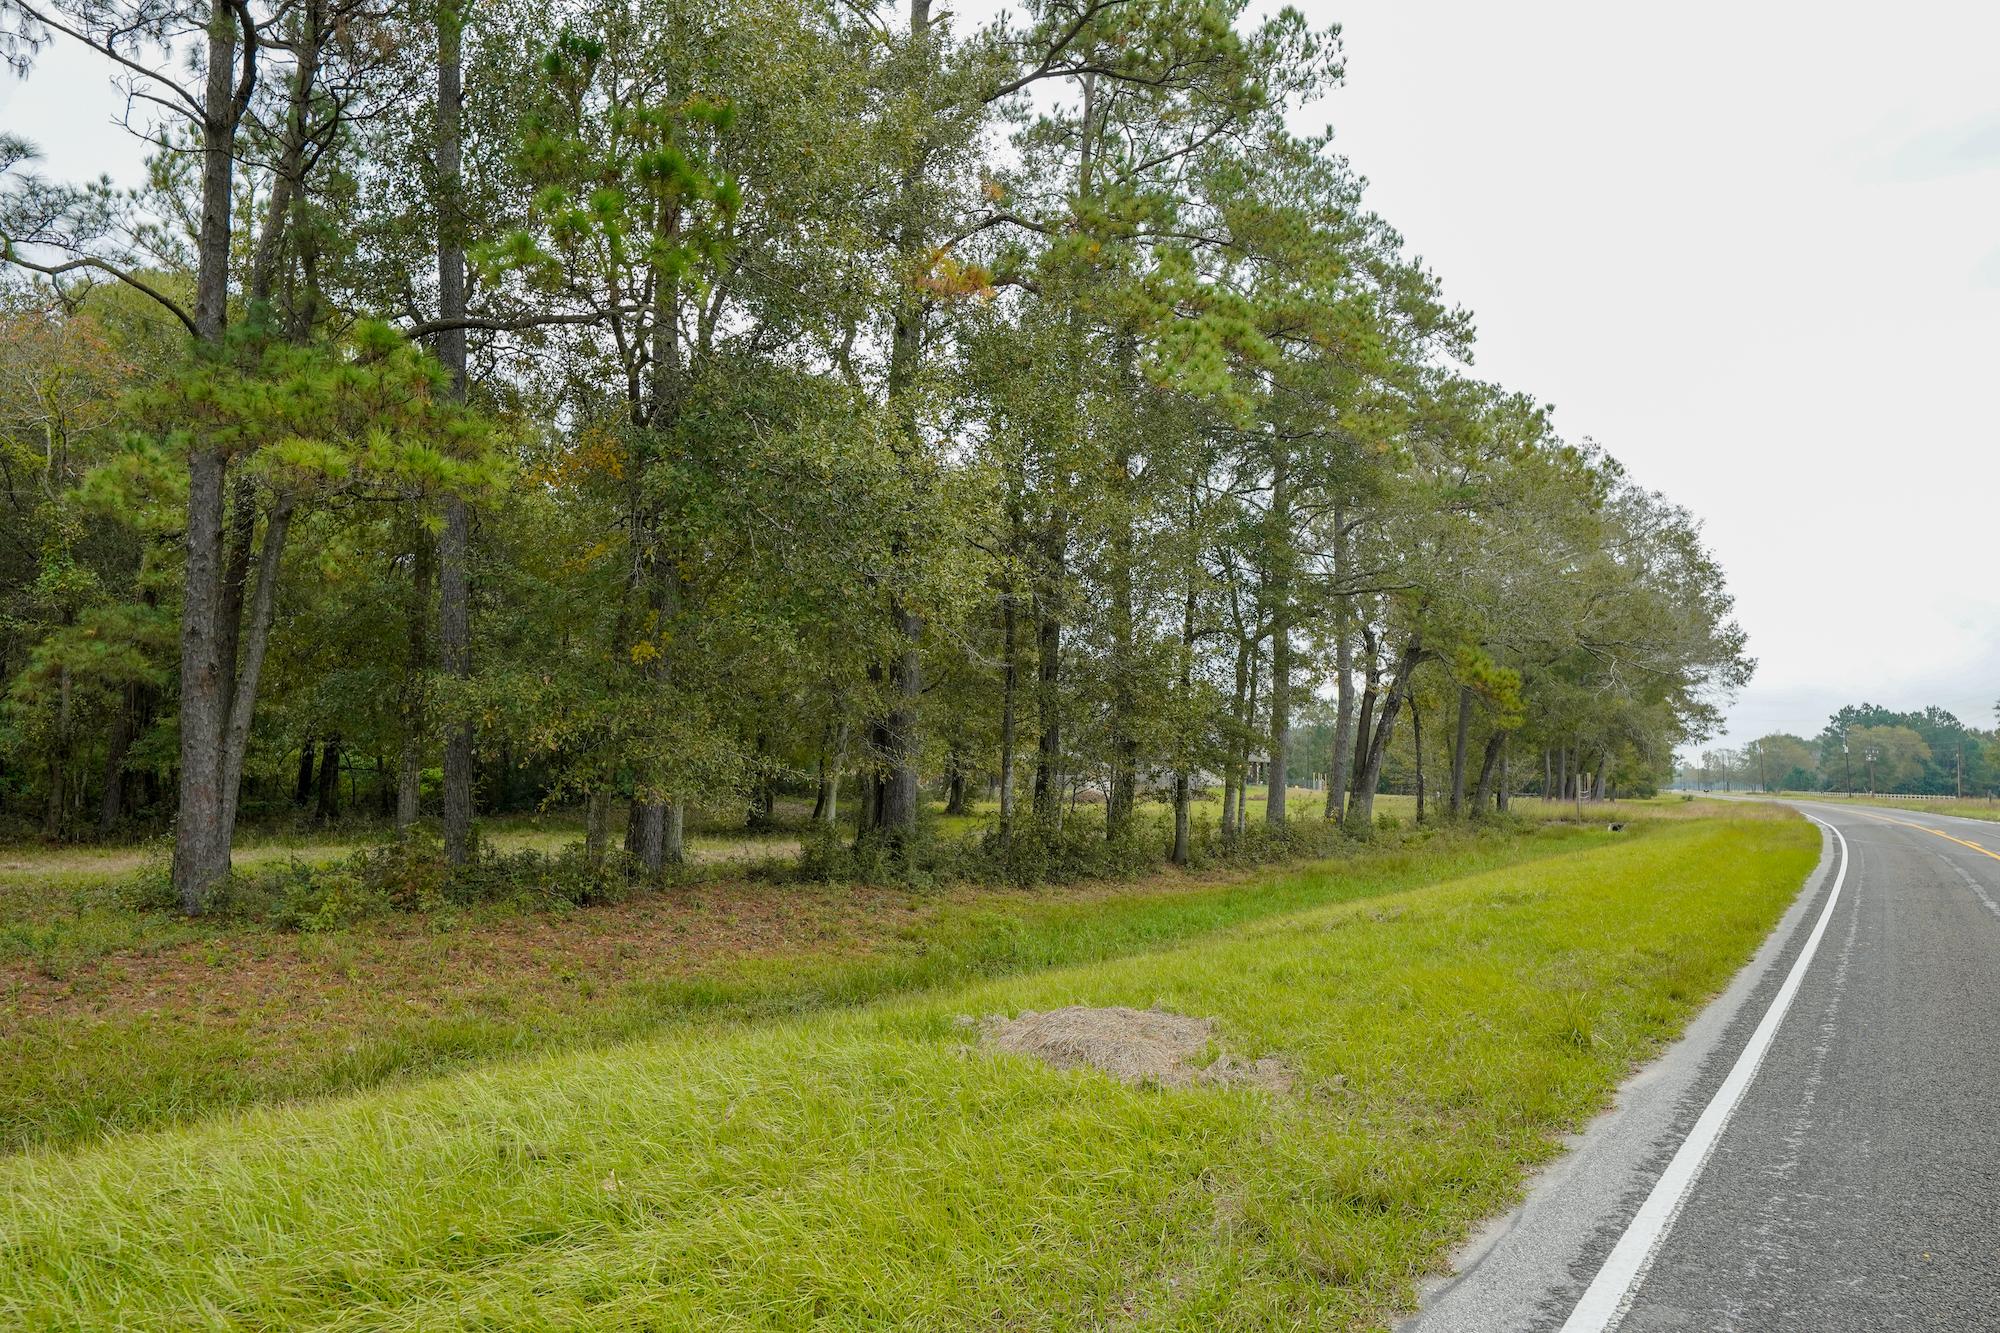 Jefferson County Development Land - Image 28 of 36